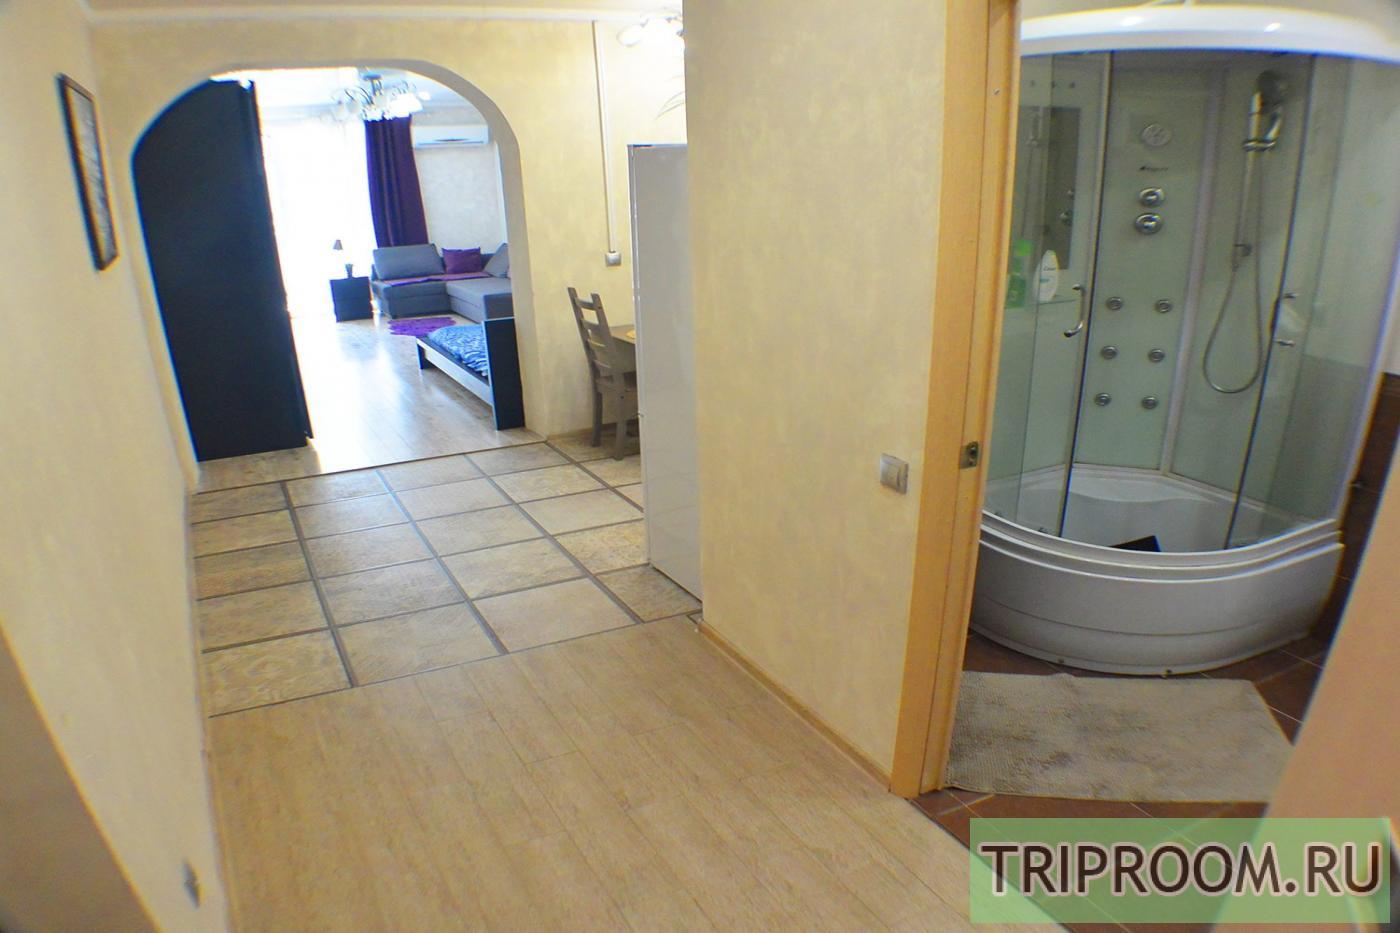 1-комнатная квартира посуточно (вариант № 26990), ул. Кирпичная улица, фото № 18